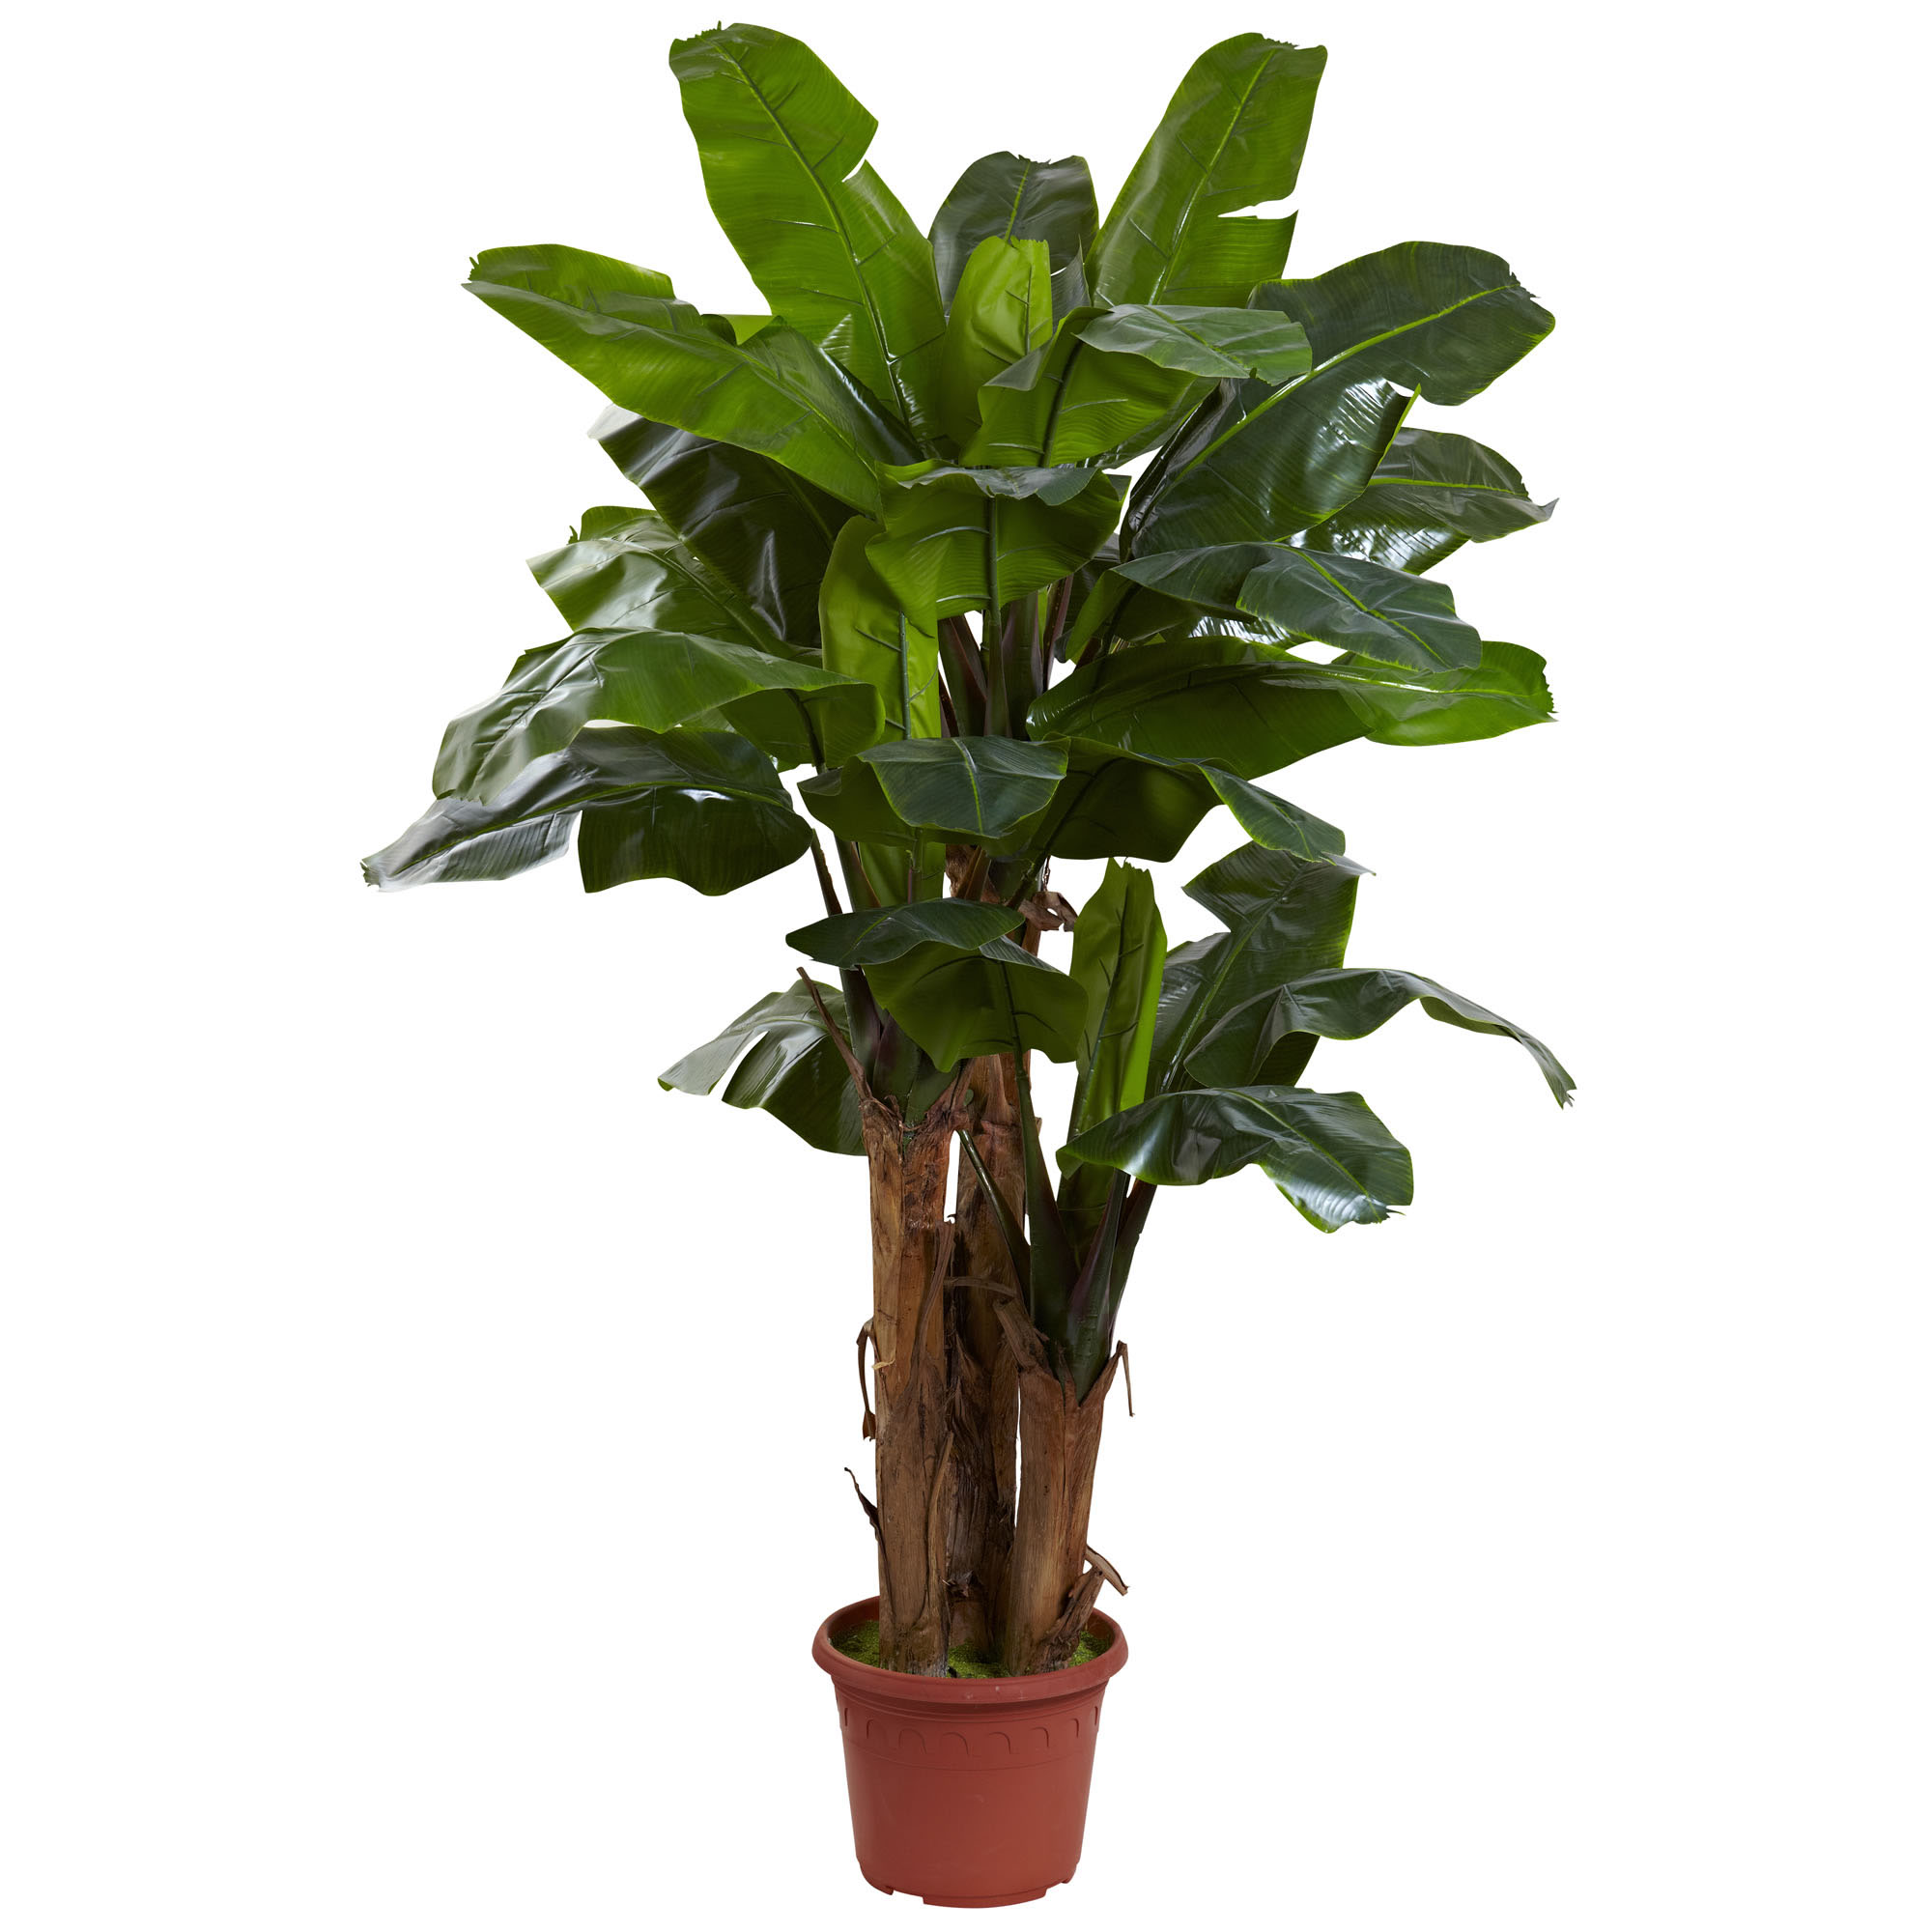 7 Foot Giant Outdoor Triple Stalk Banana Tree Limited Uv